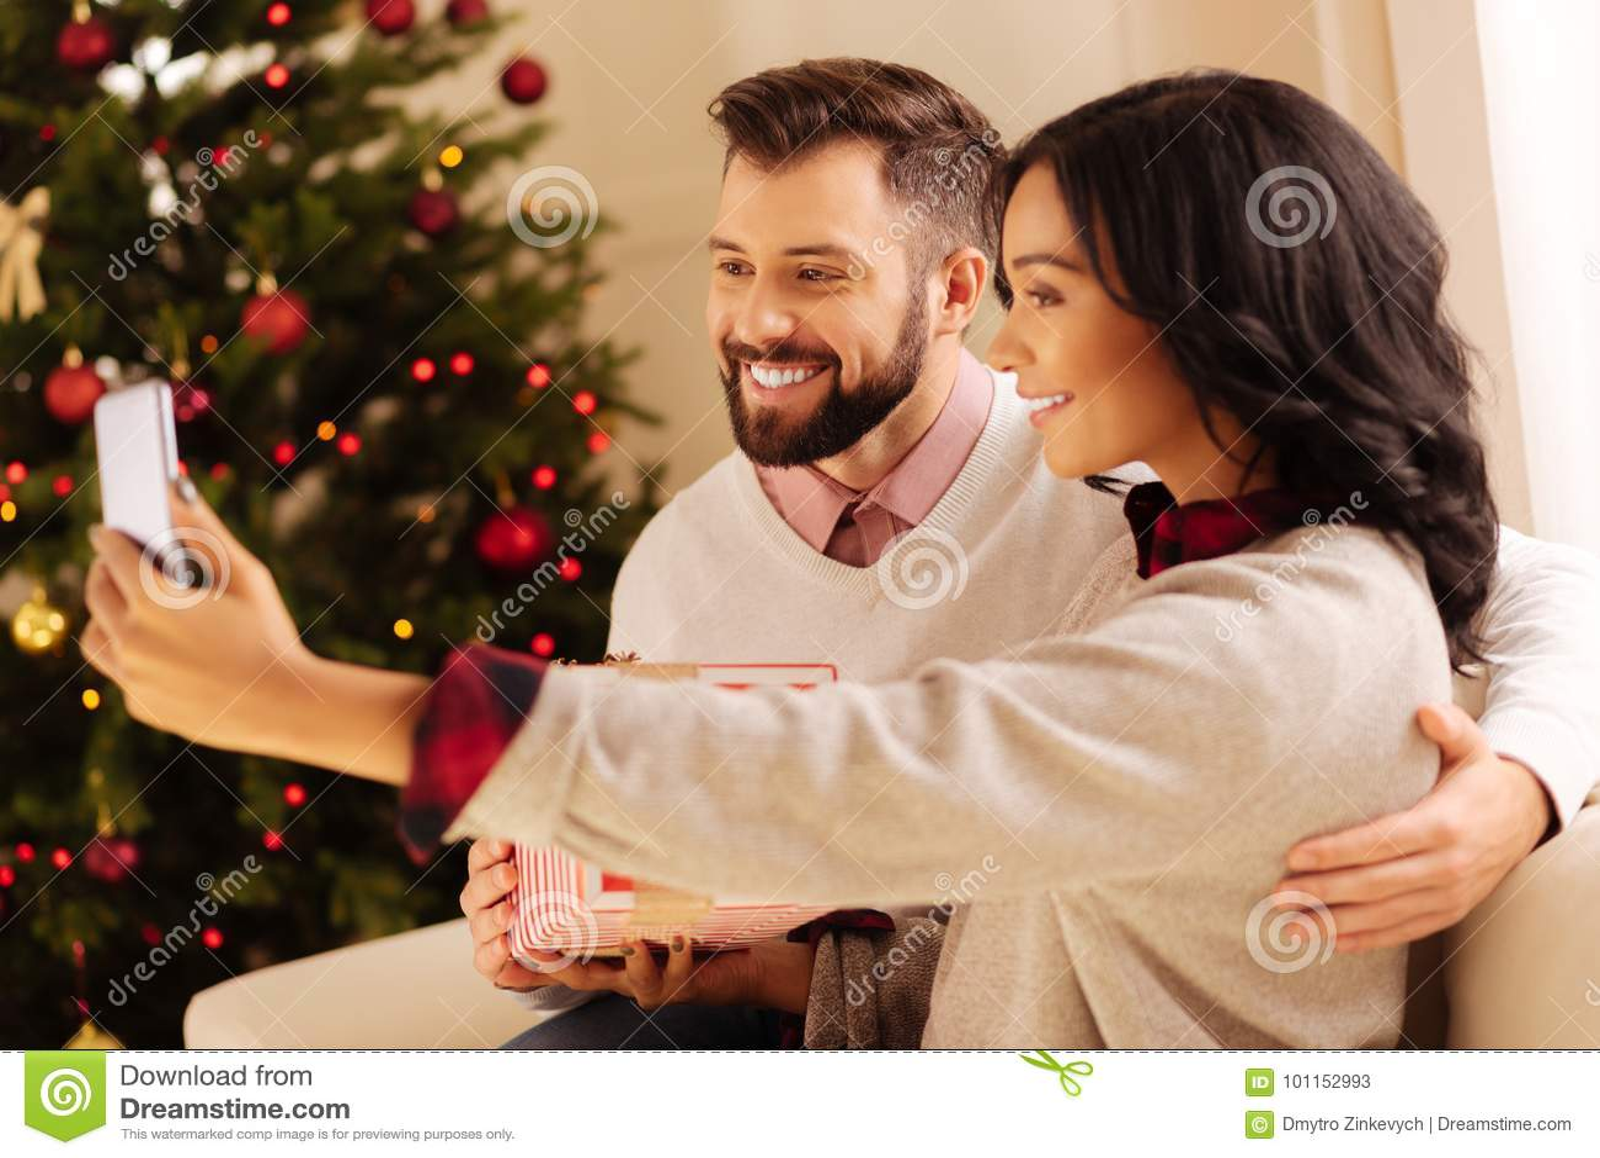 https://thumbs.dreamstime.com/z/happy-international-couple-taking-selfies-christmas-seizing-moment-happy-young-international-couple-sitting-sofa-101152993.jpg